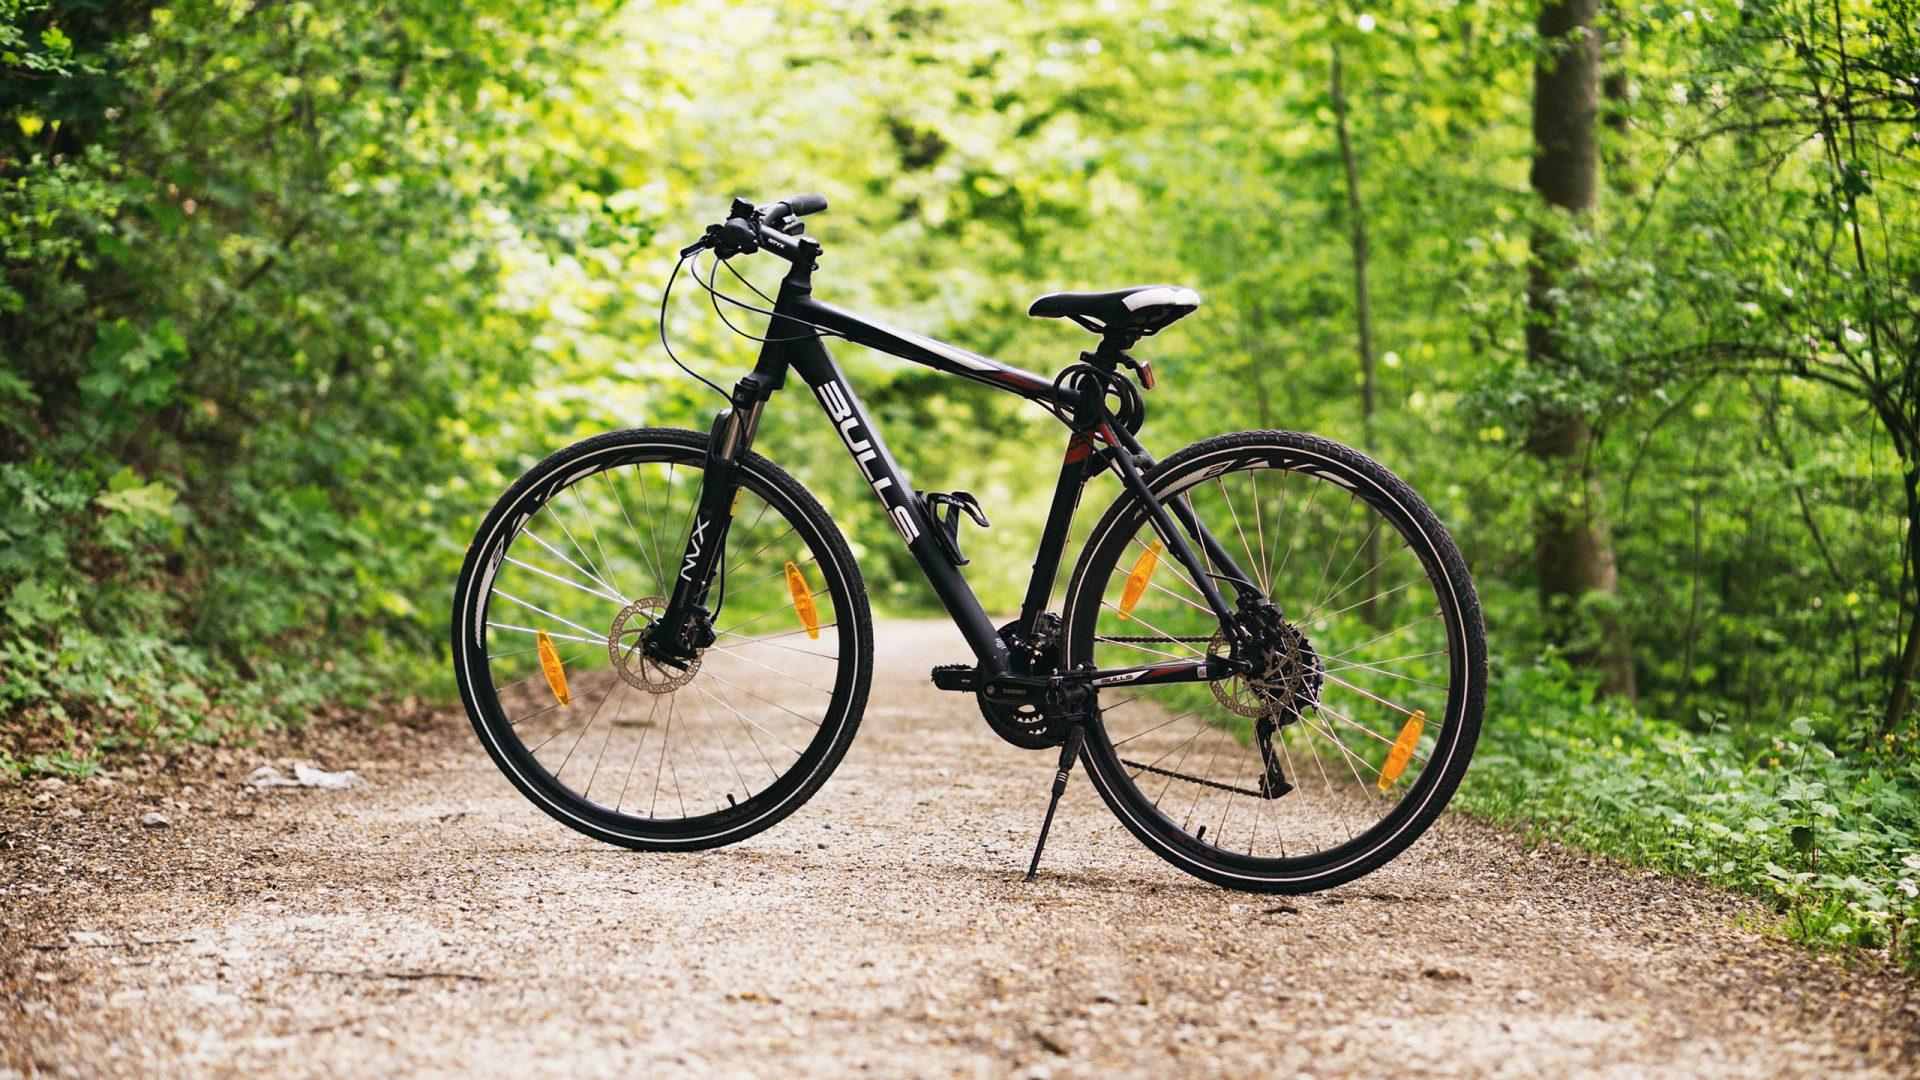 E-bike - Villamena Resort Assisi